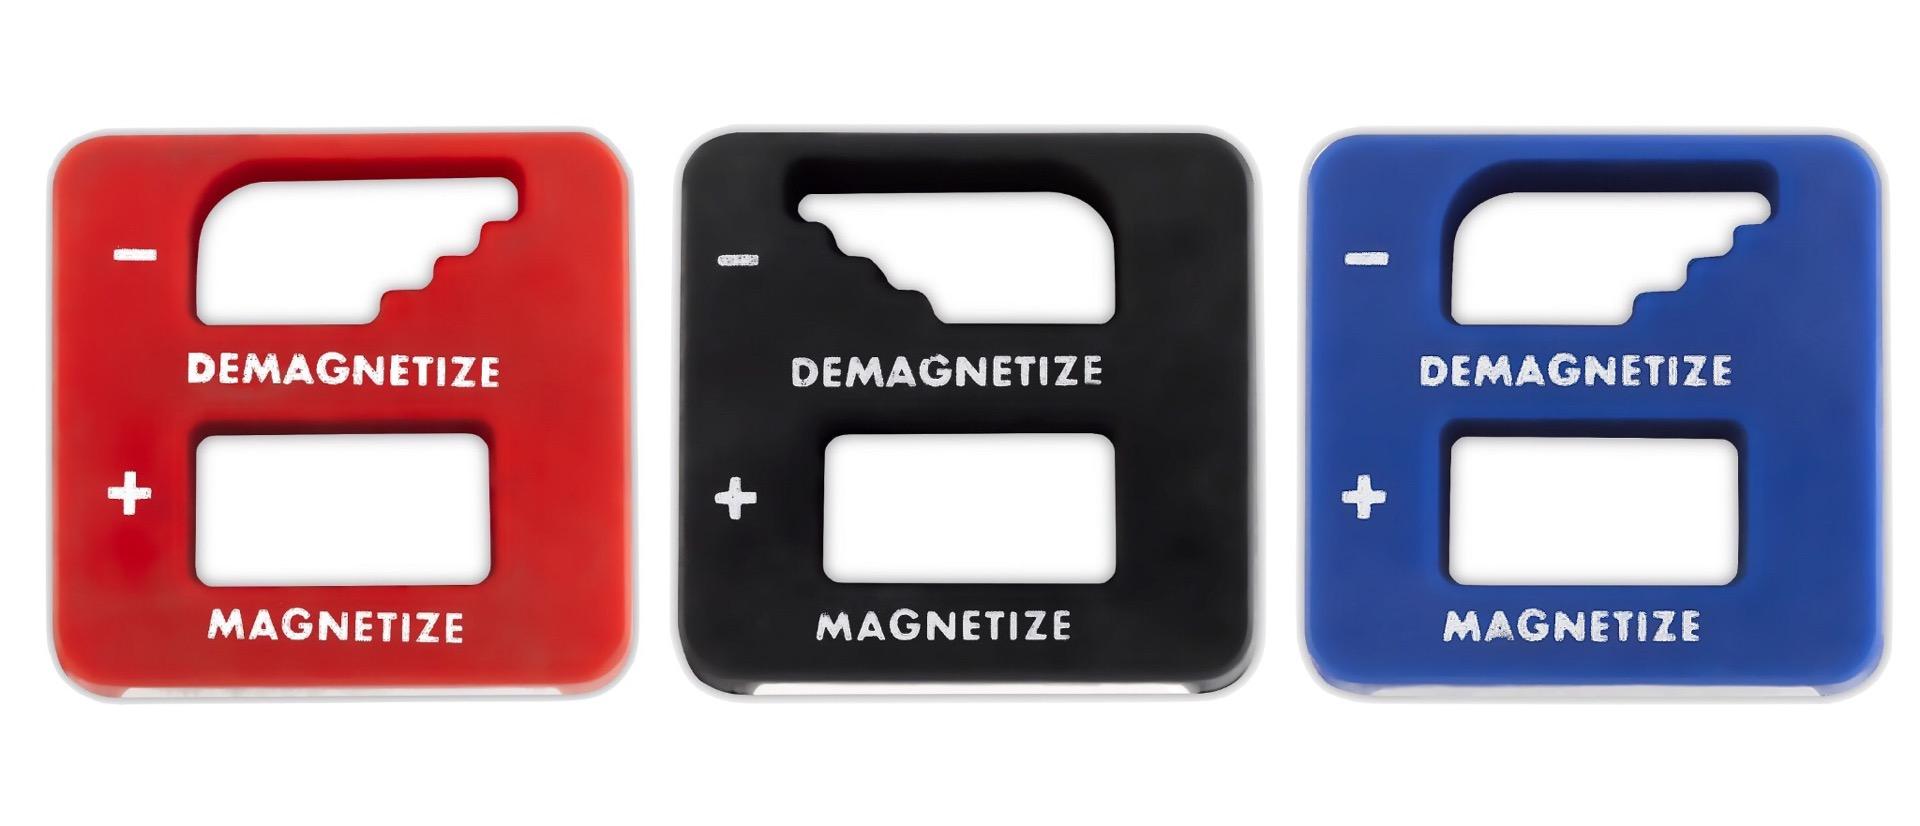 Katzco magnetizer & demagnetizer tool. ($7)